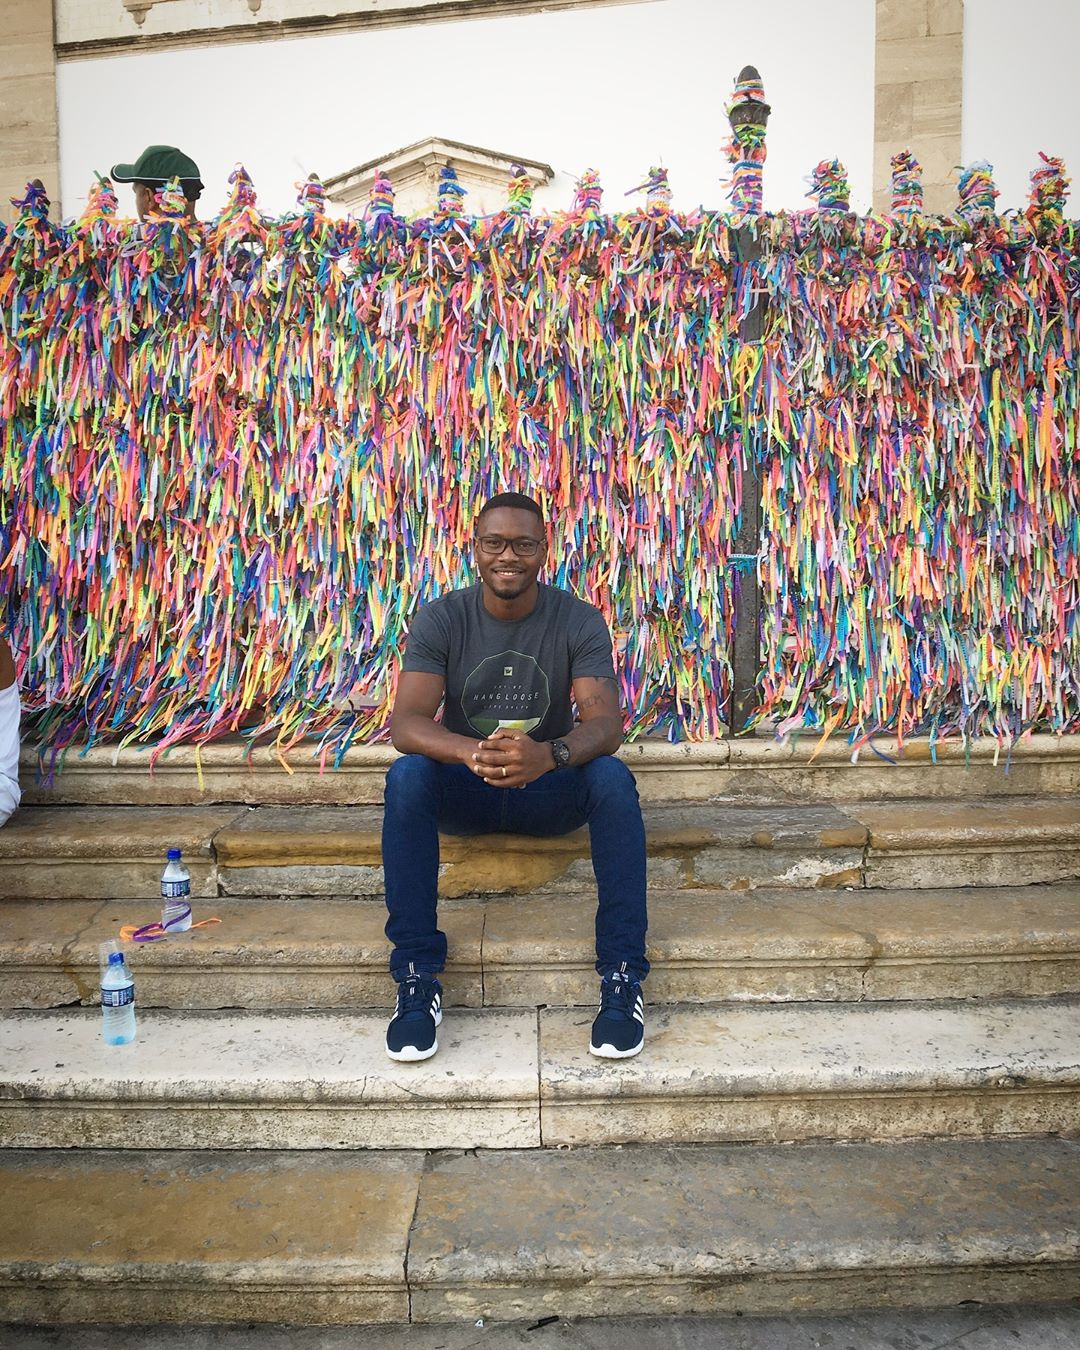 Marques Coleman